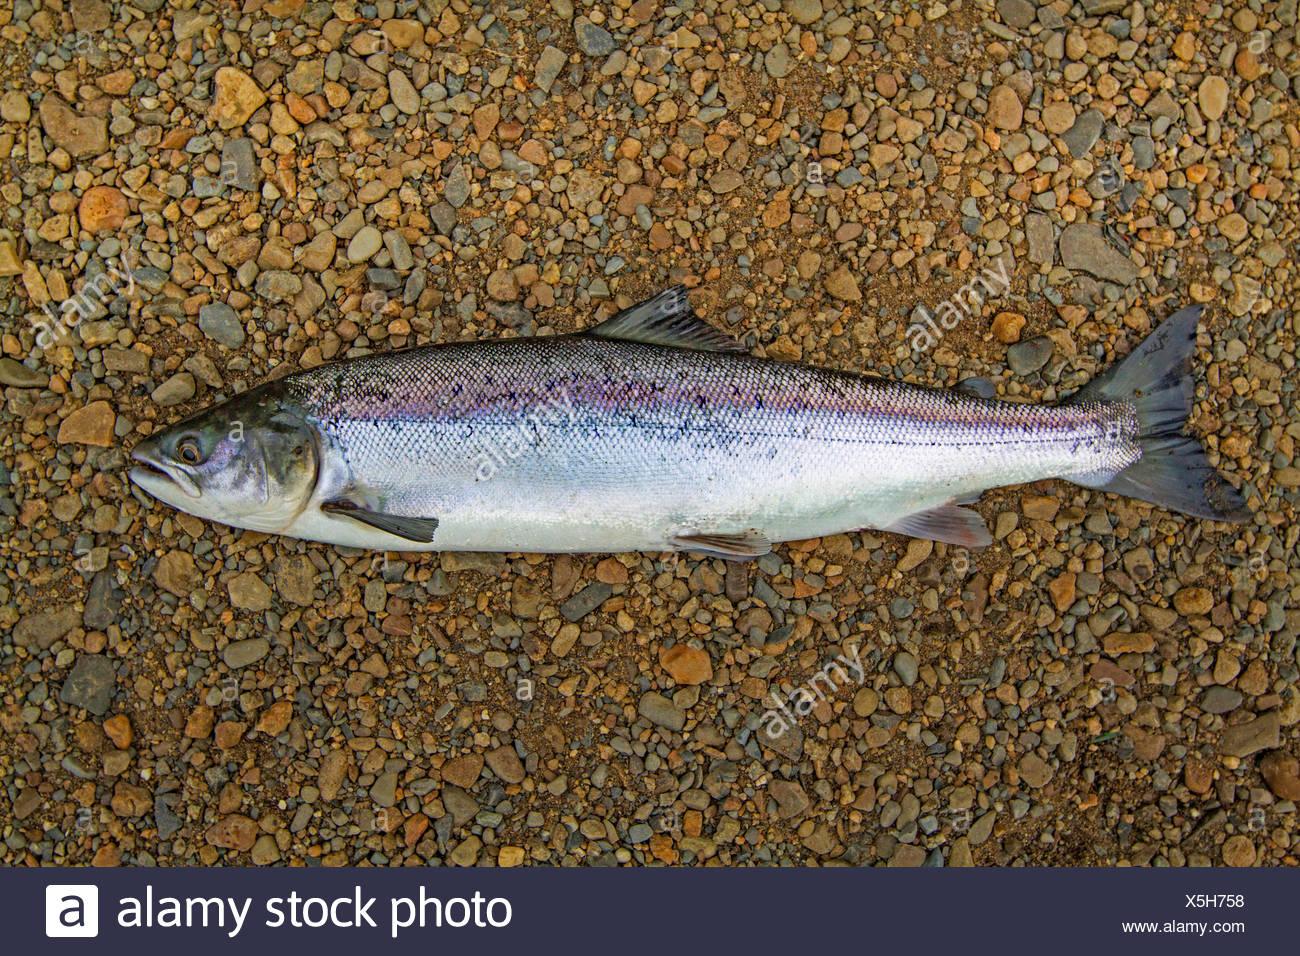 Atlantic salmon, ouananiche, lake Atlantic salmon, landlocked salmon, Sebago salmon (Salmo salar), smolt, Ireland, River Moy - Stock Image